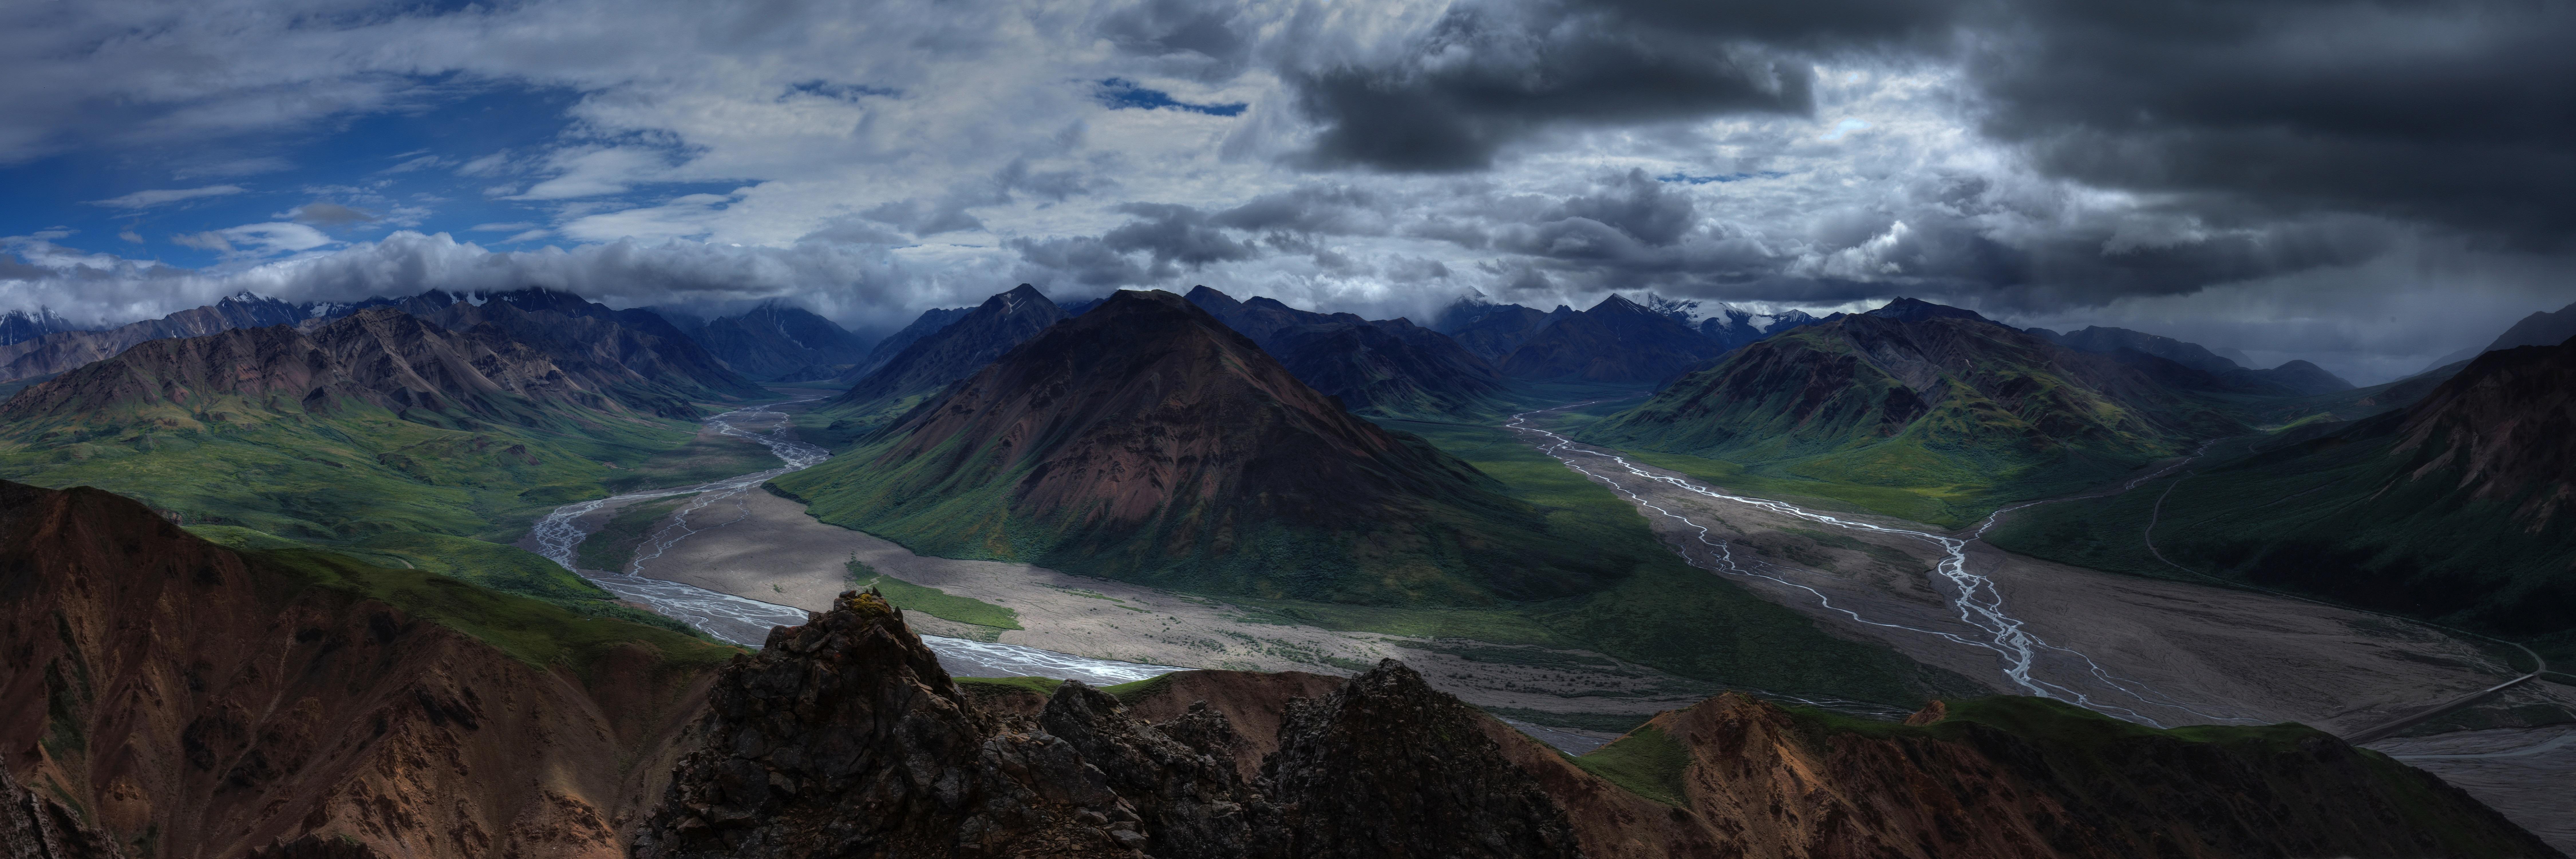 Kostenlose foto : Landschaft, Natur, Wildnis, Berg, Tal ...